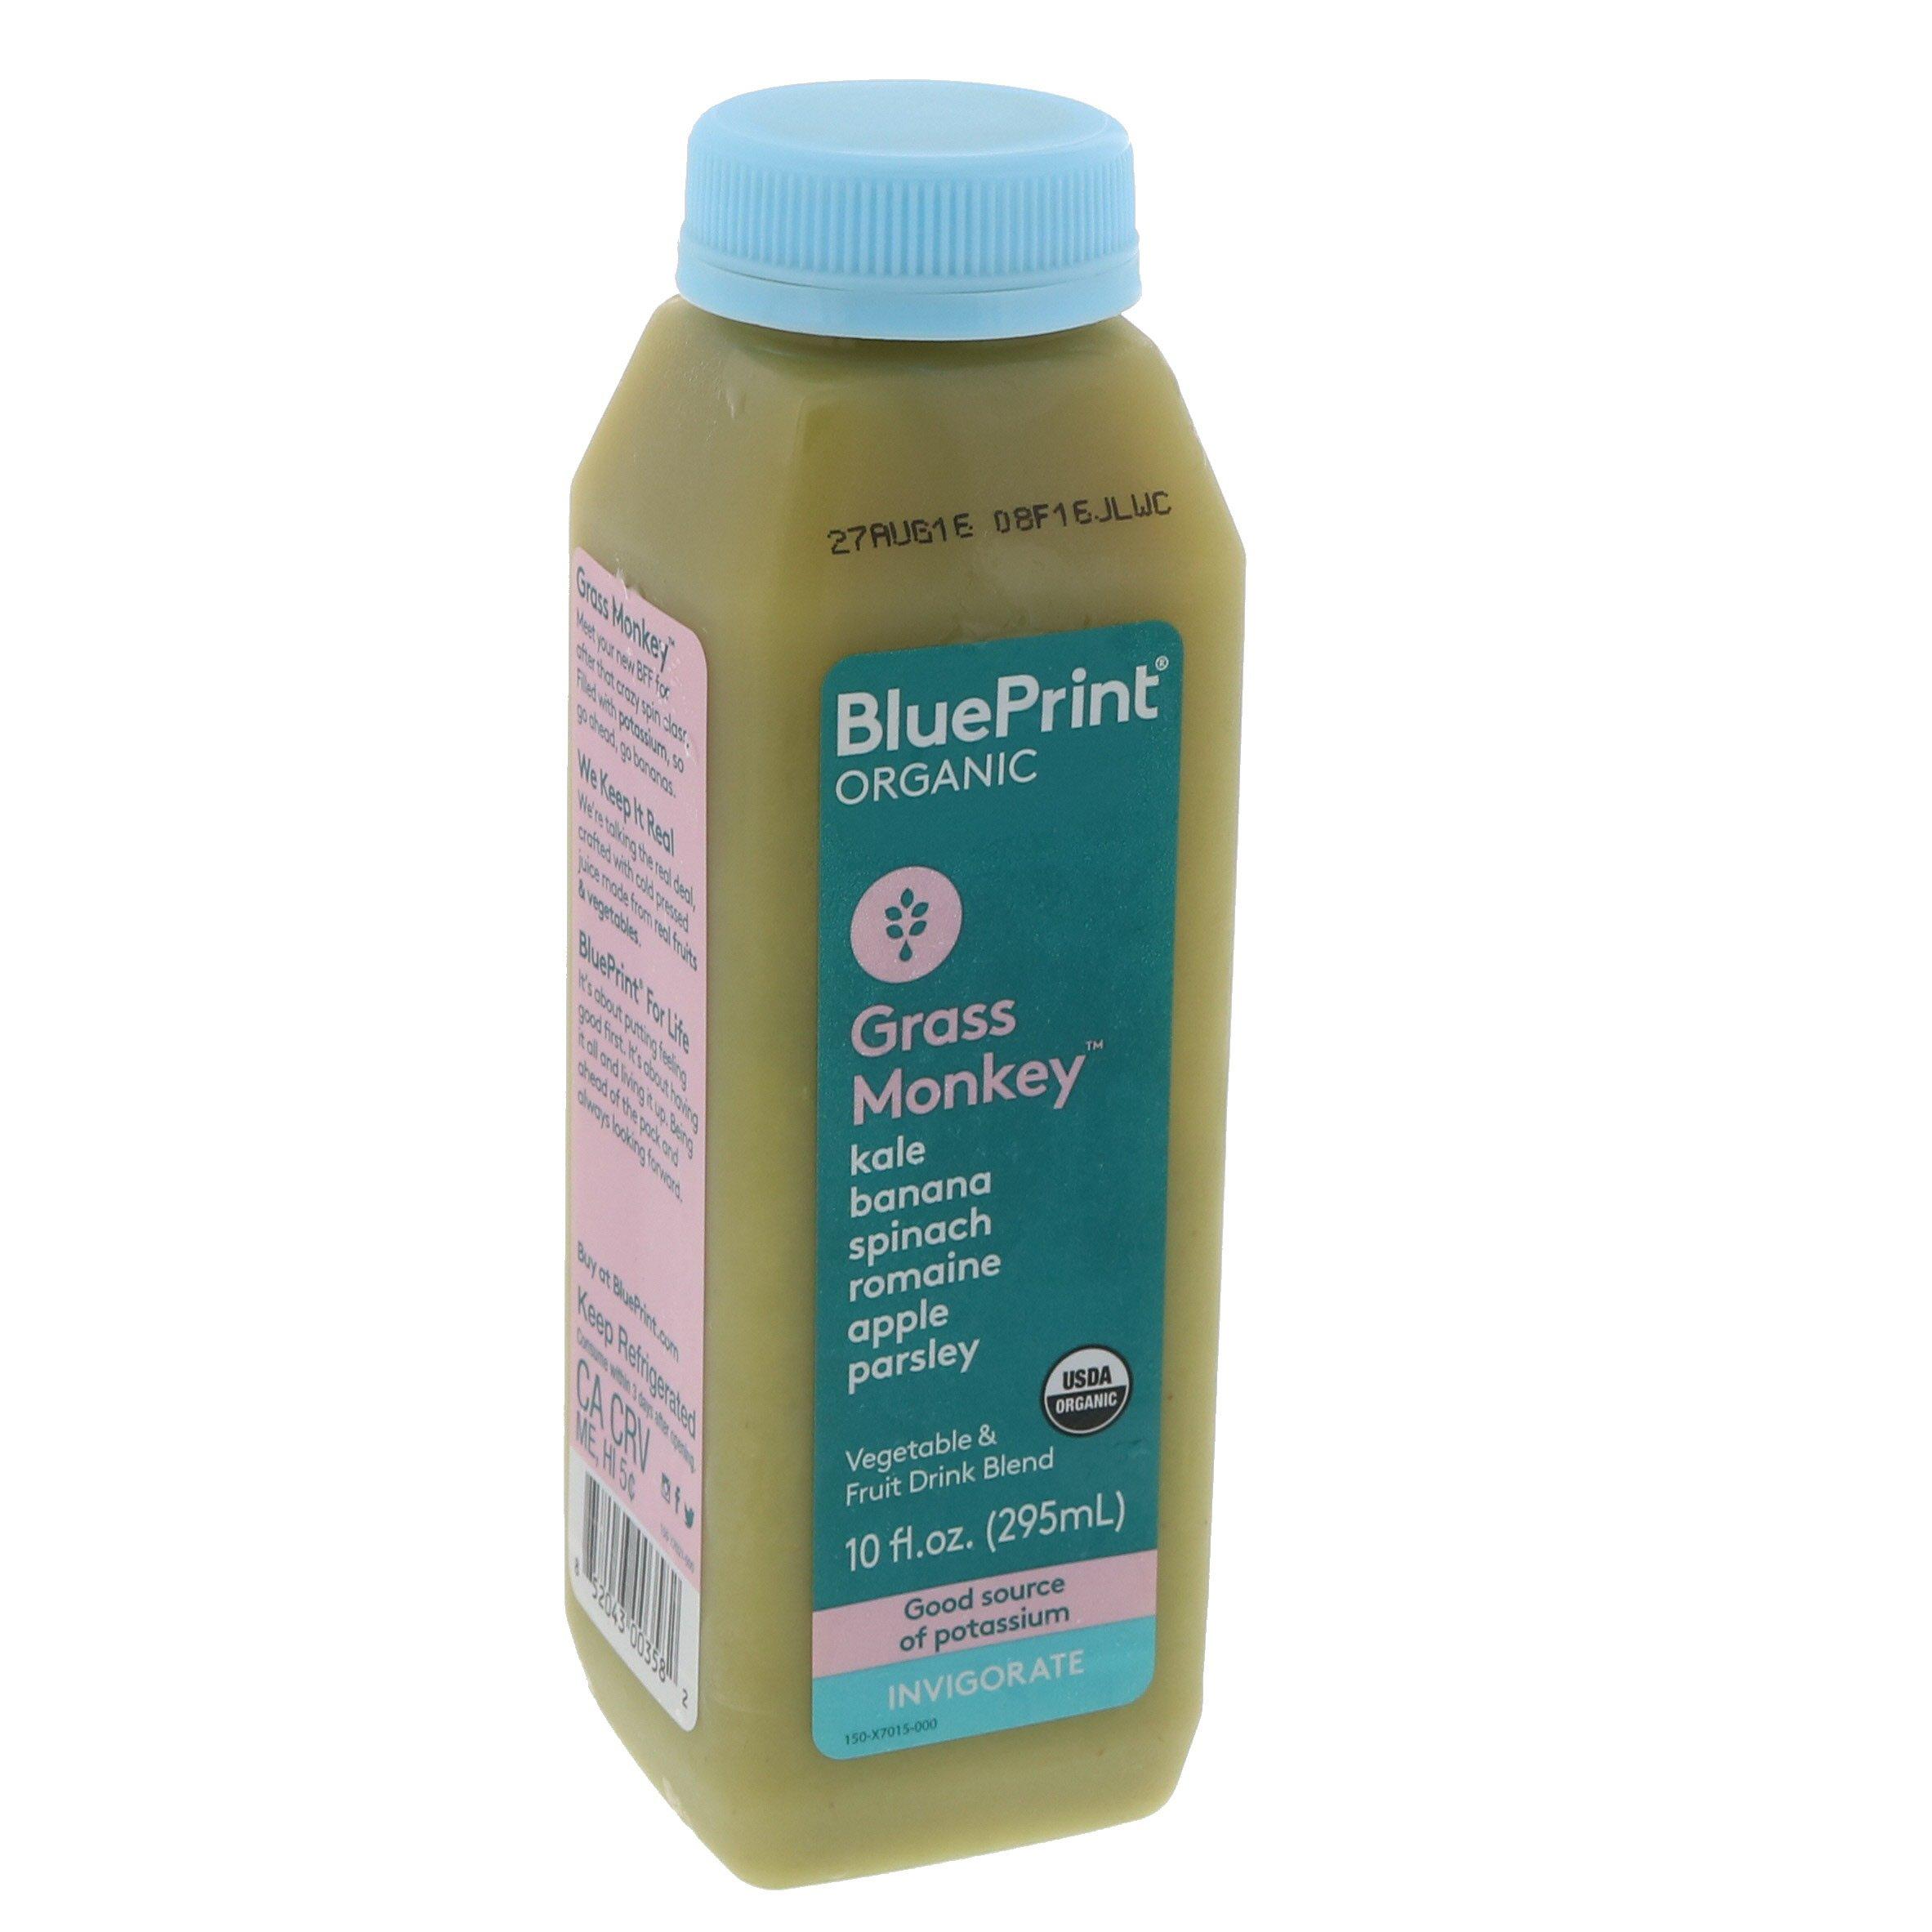 Blueprint grass monkey vegetable fruit drink blend shop fruit blueprint grass monkey vegetable fruit drink blend shop fruit juices and blends at heb malvernweather Images